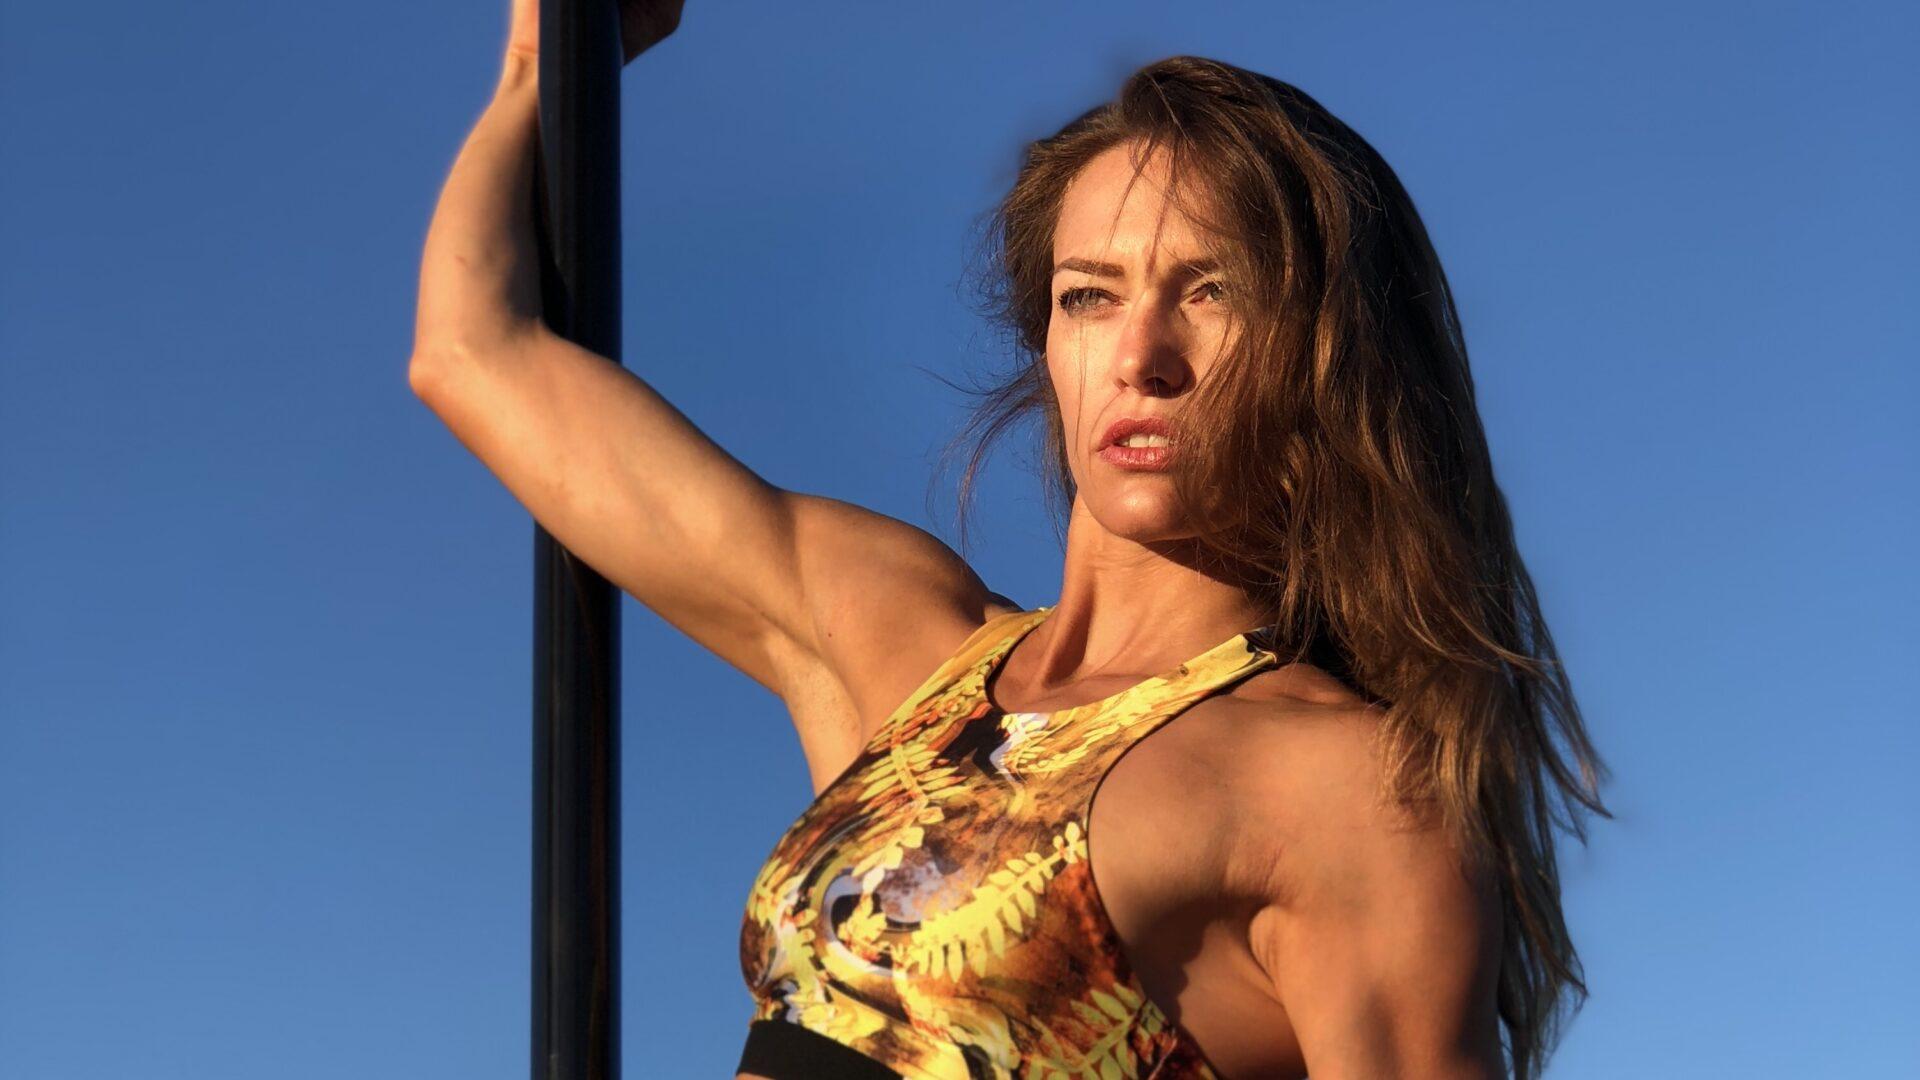 Manuela Badessi